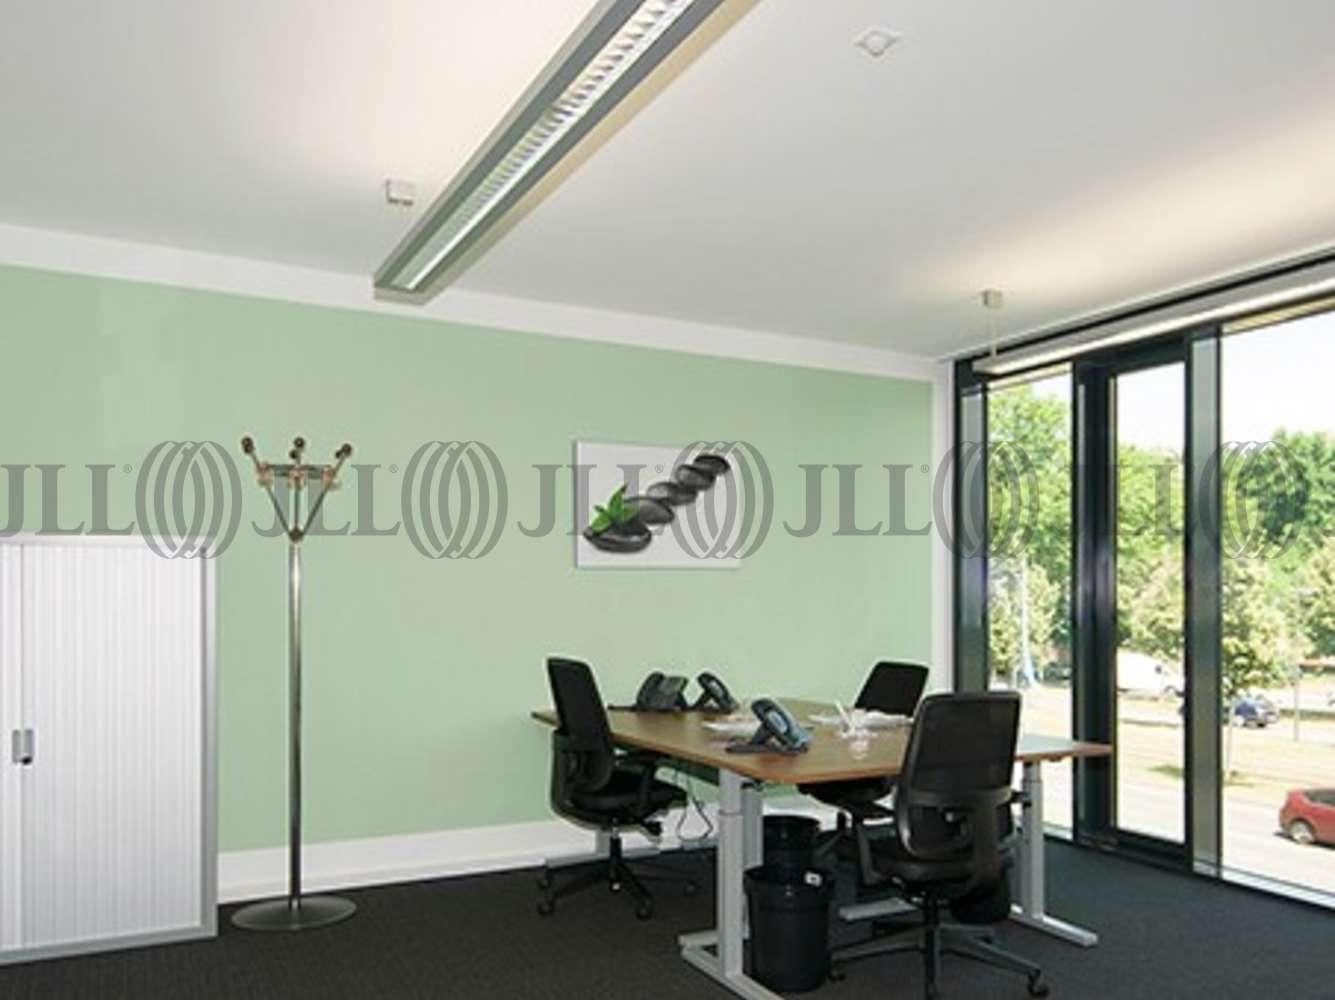 Coworking / flex office Karlsruhe, 76131 -  Karlsruhe - C0080